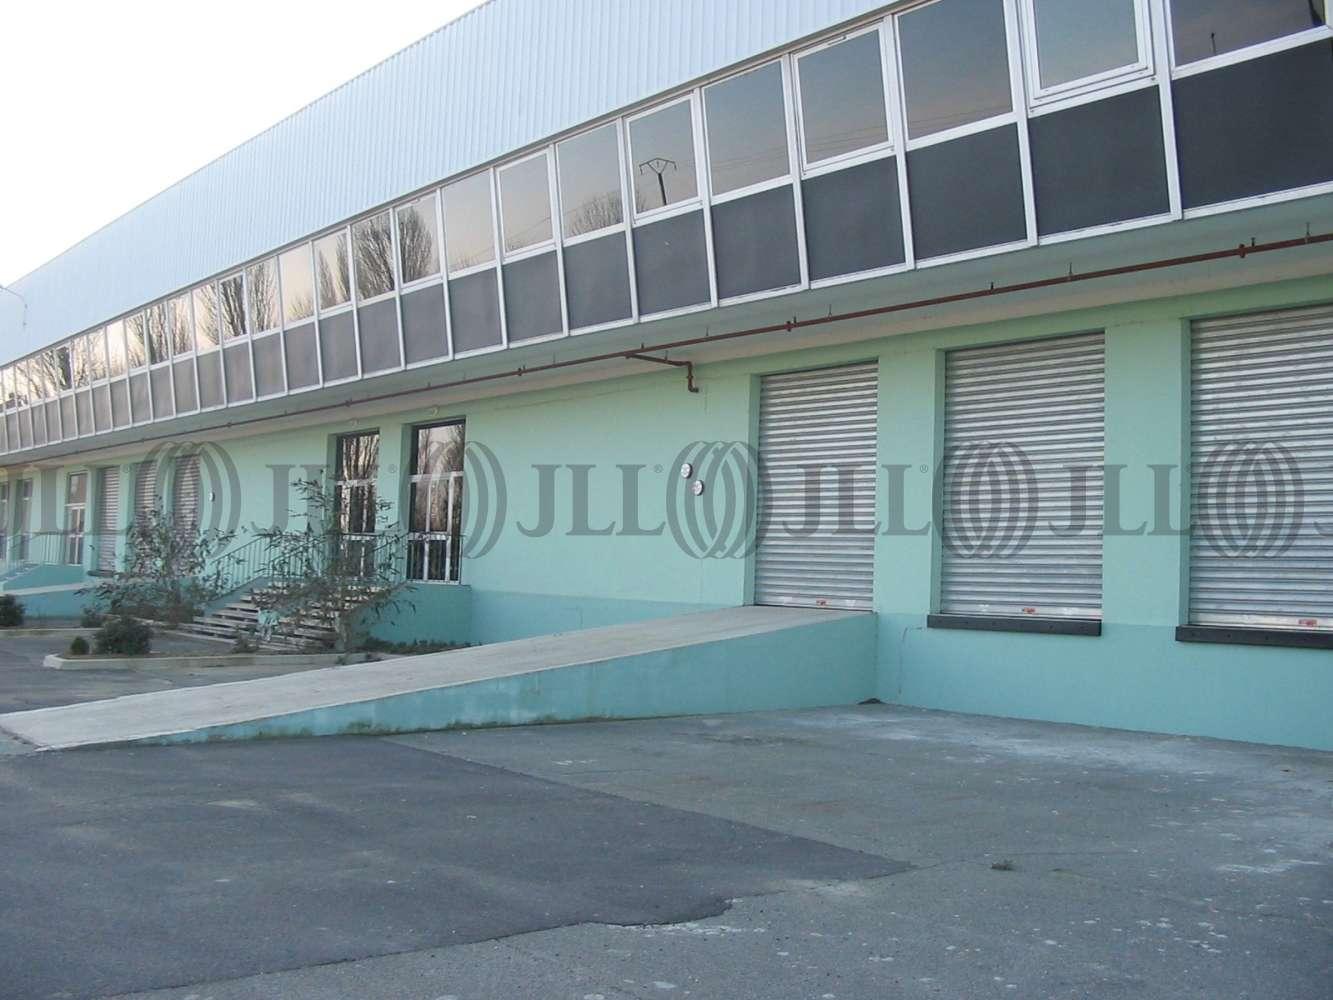 Activités/entrepôt Marly la ville, 95670